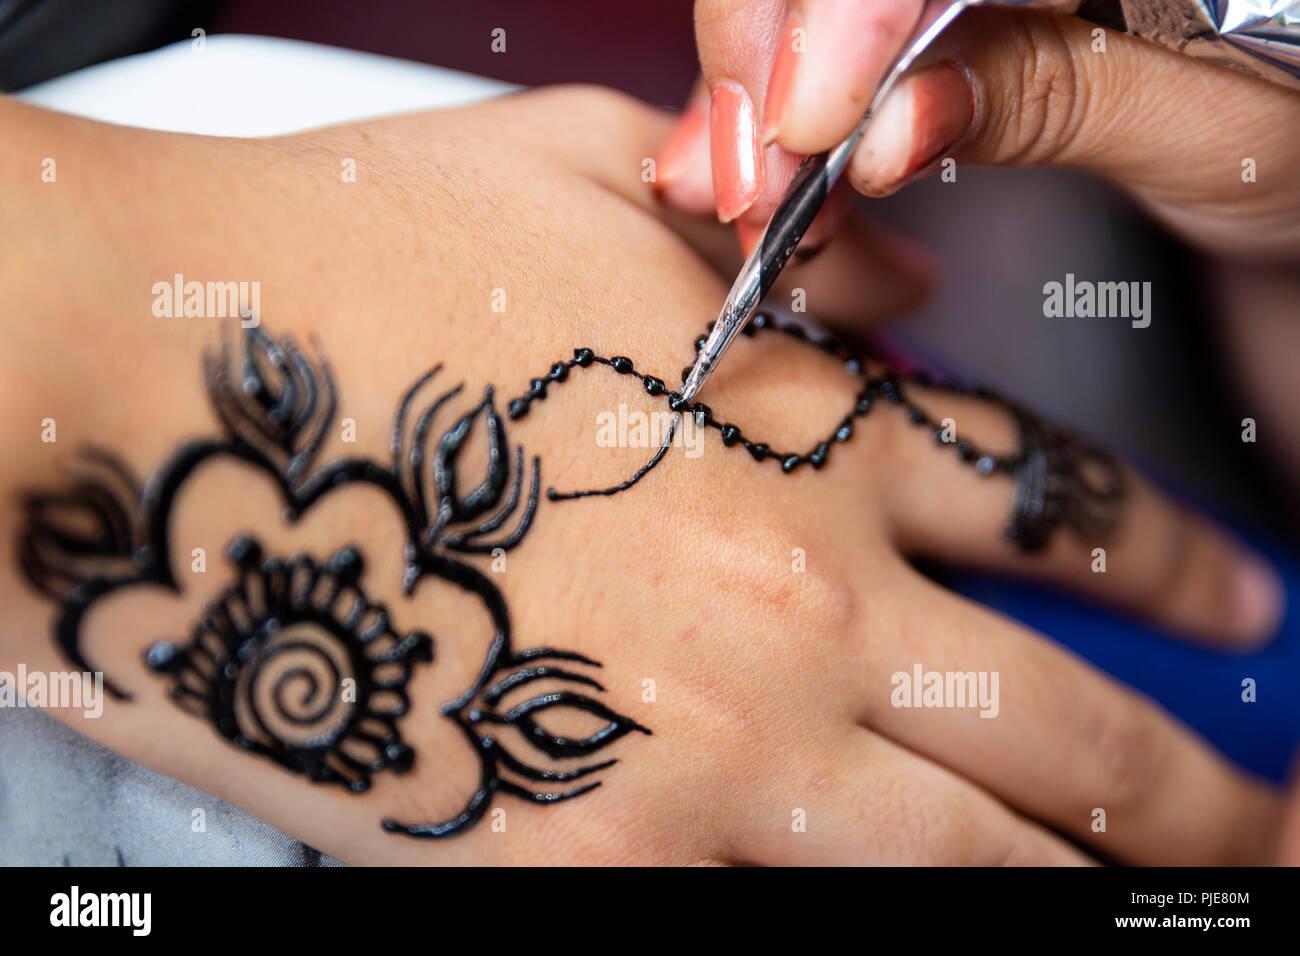 7cf587e68 Woman painting black henna tattoo on a girl's hand Stock Photo ...